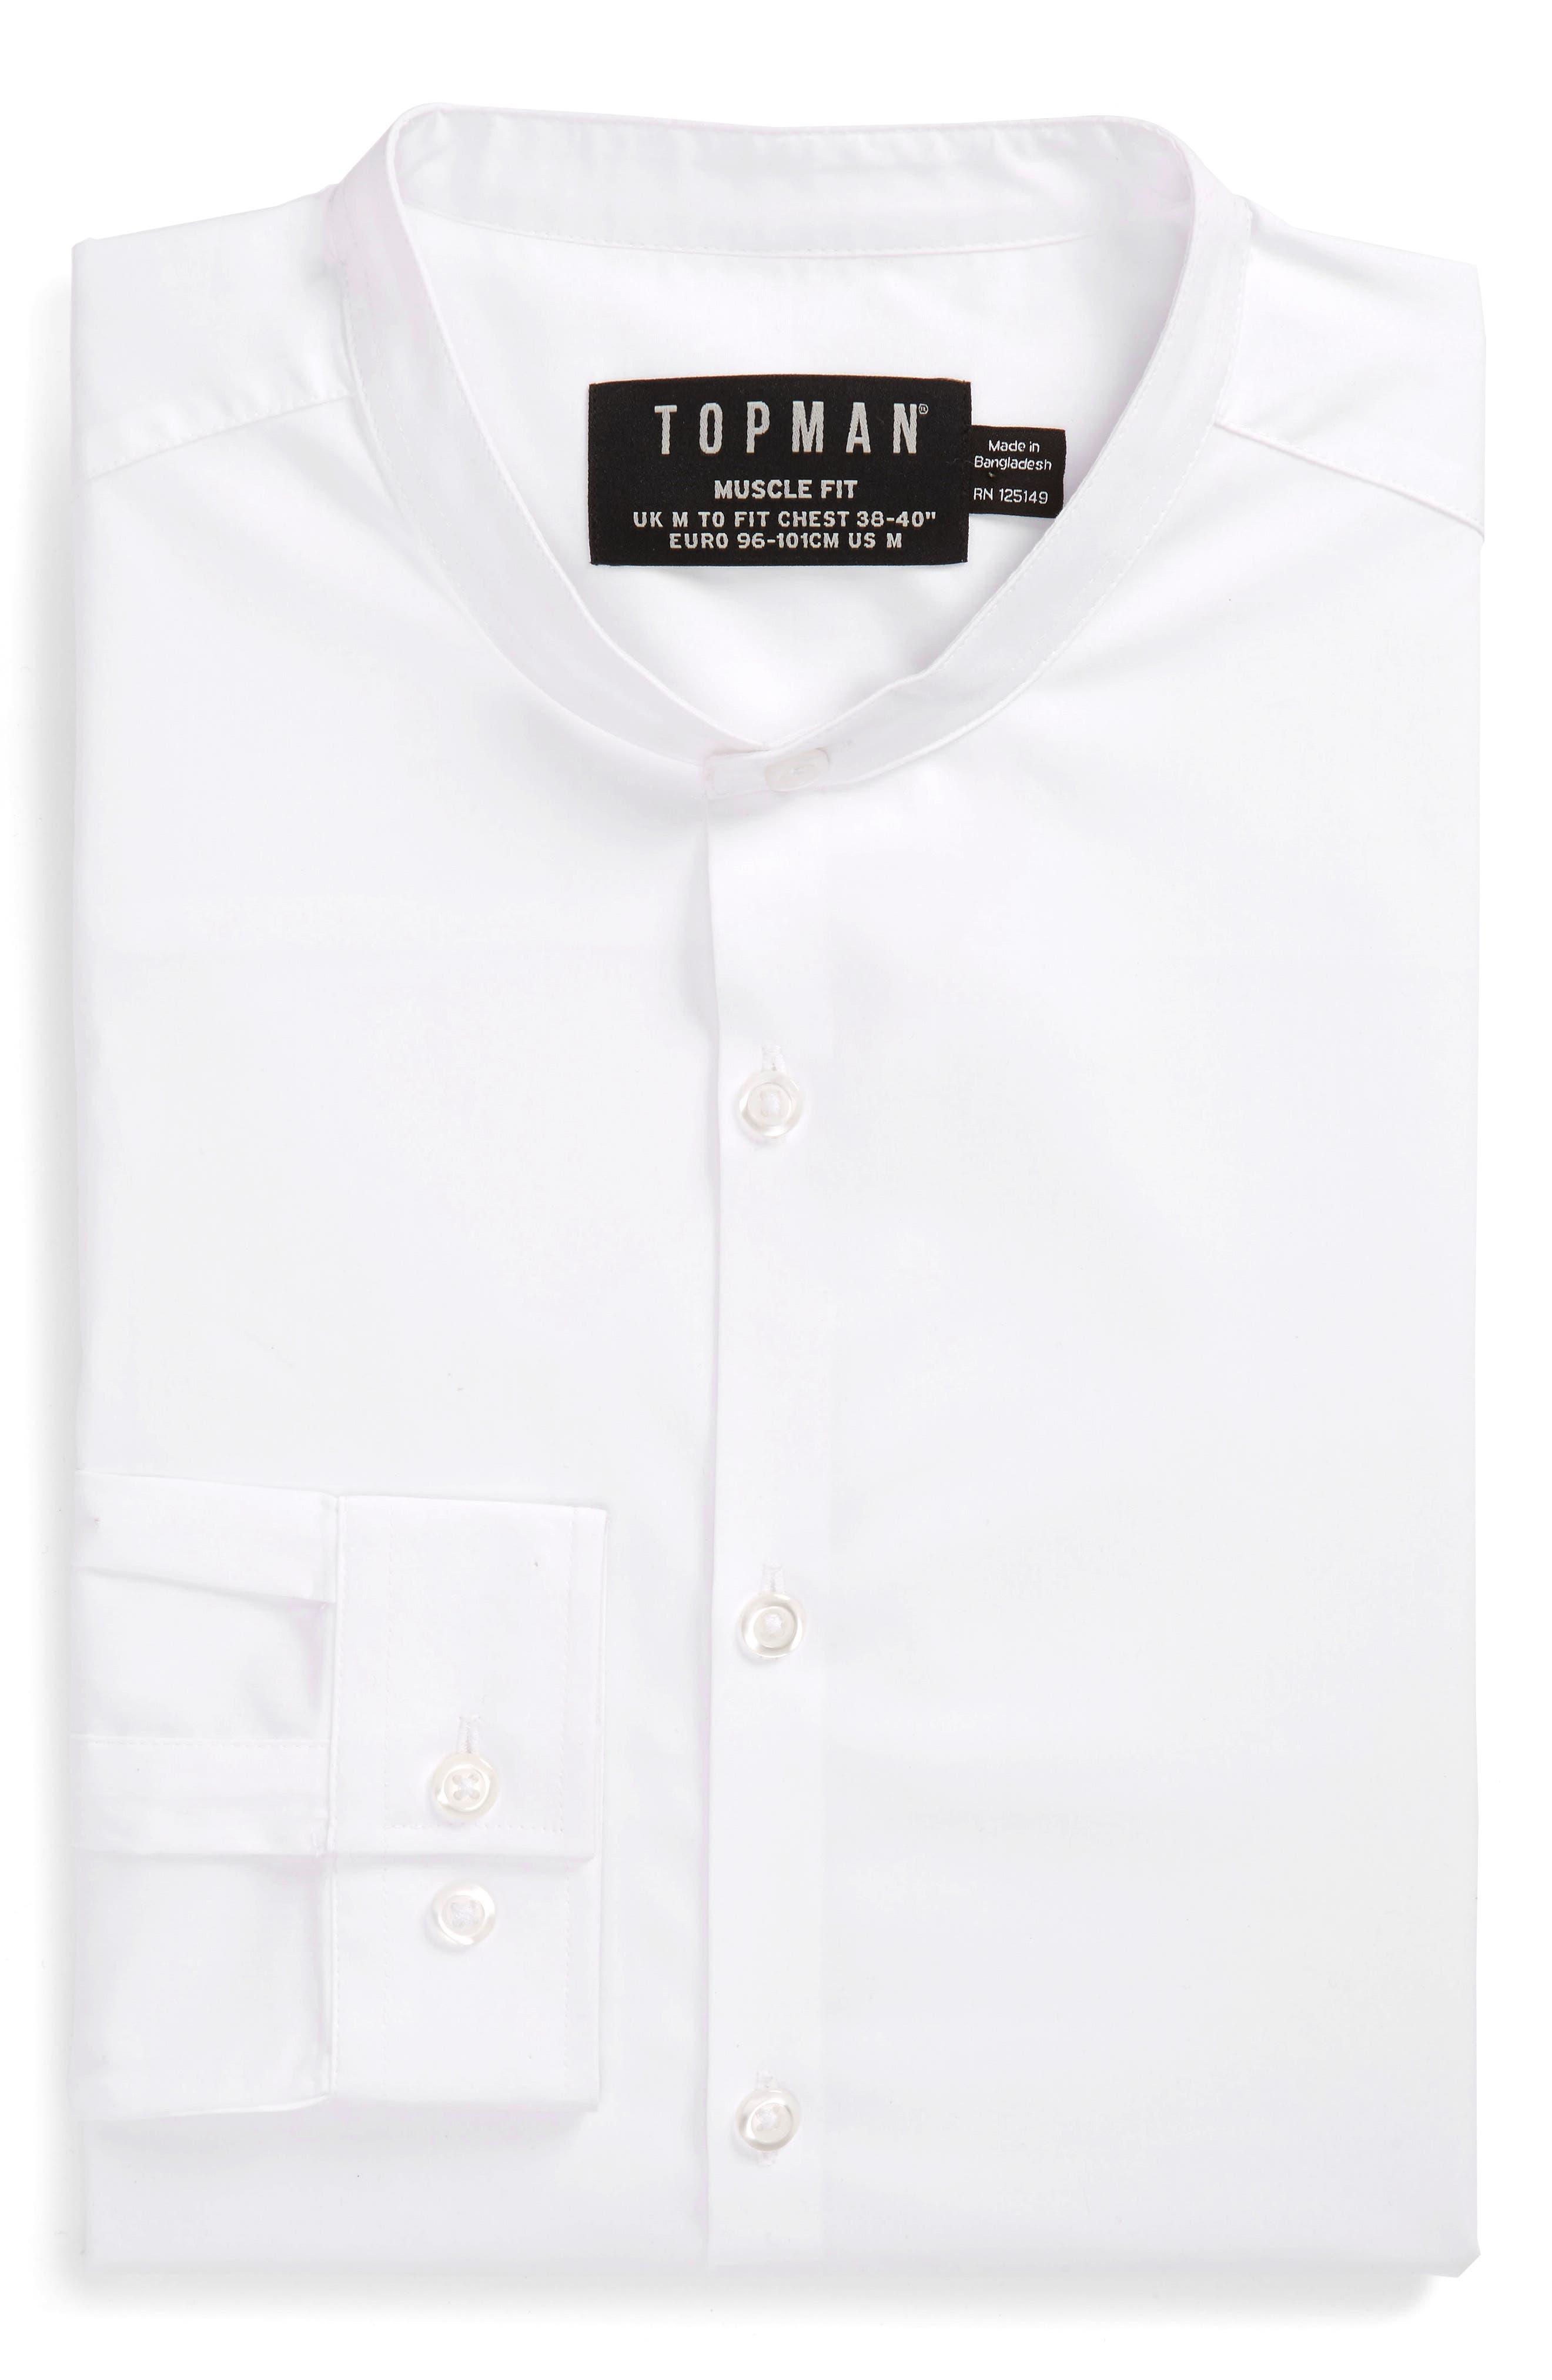 Main Image - Topman Band Collar Skinny Fit Dress Shirt